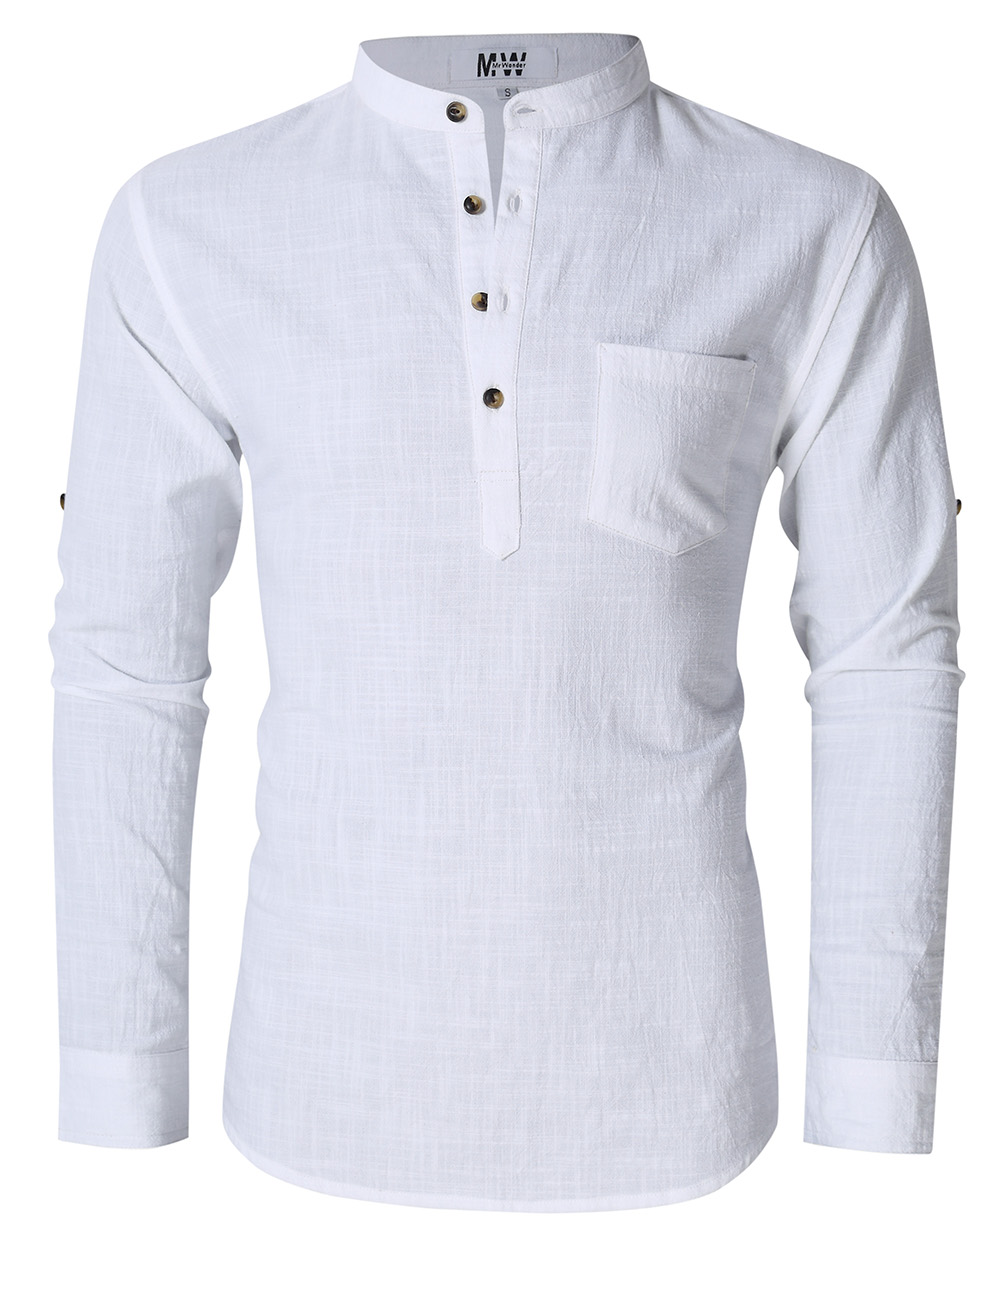 MrWonder Men's Casual Slim Fit Henley Neck Long Sleeve Linen Shirt White_XL